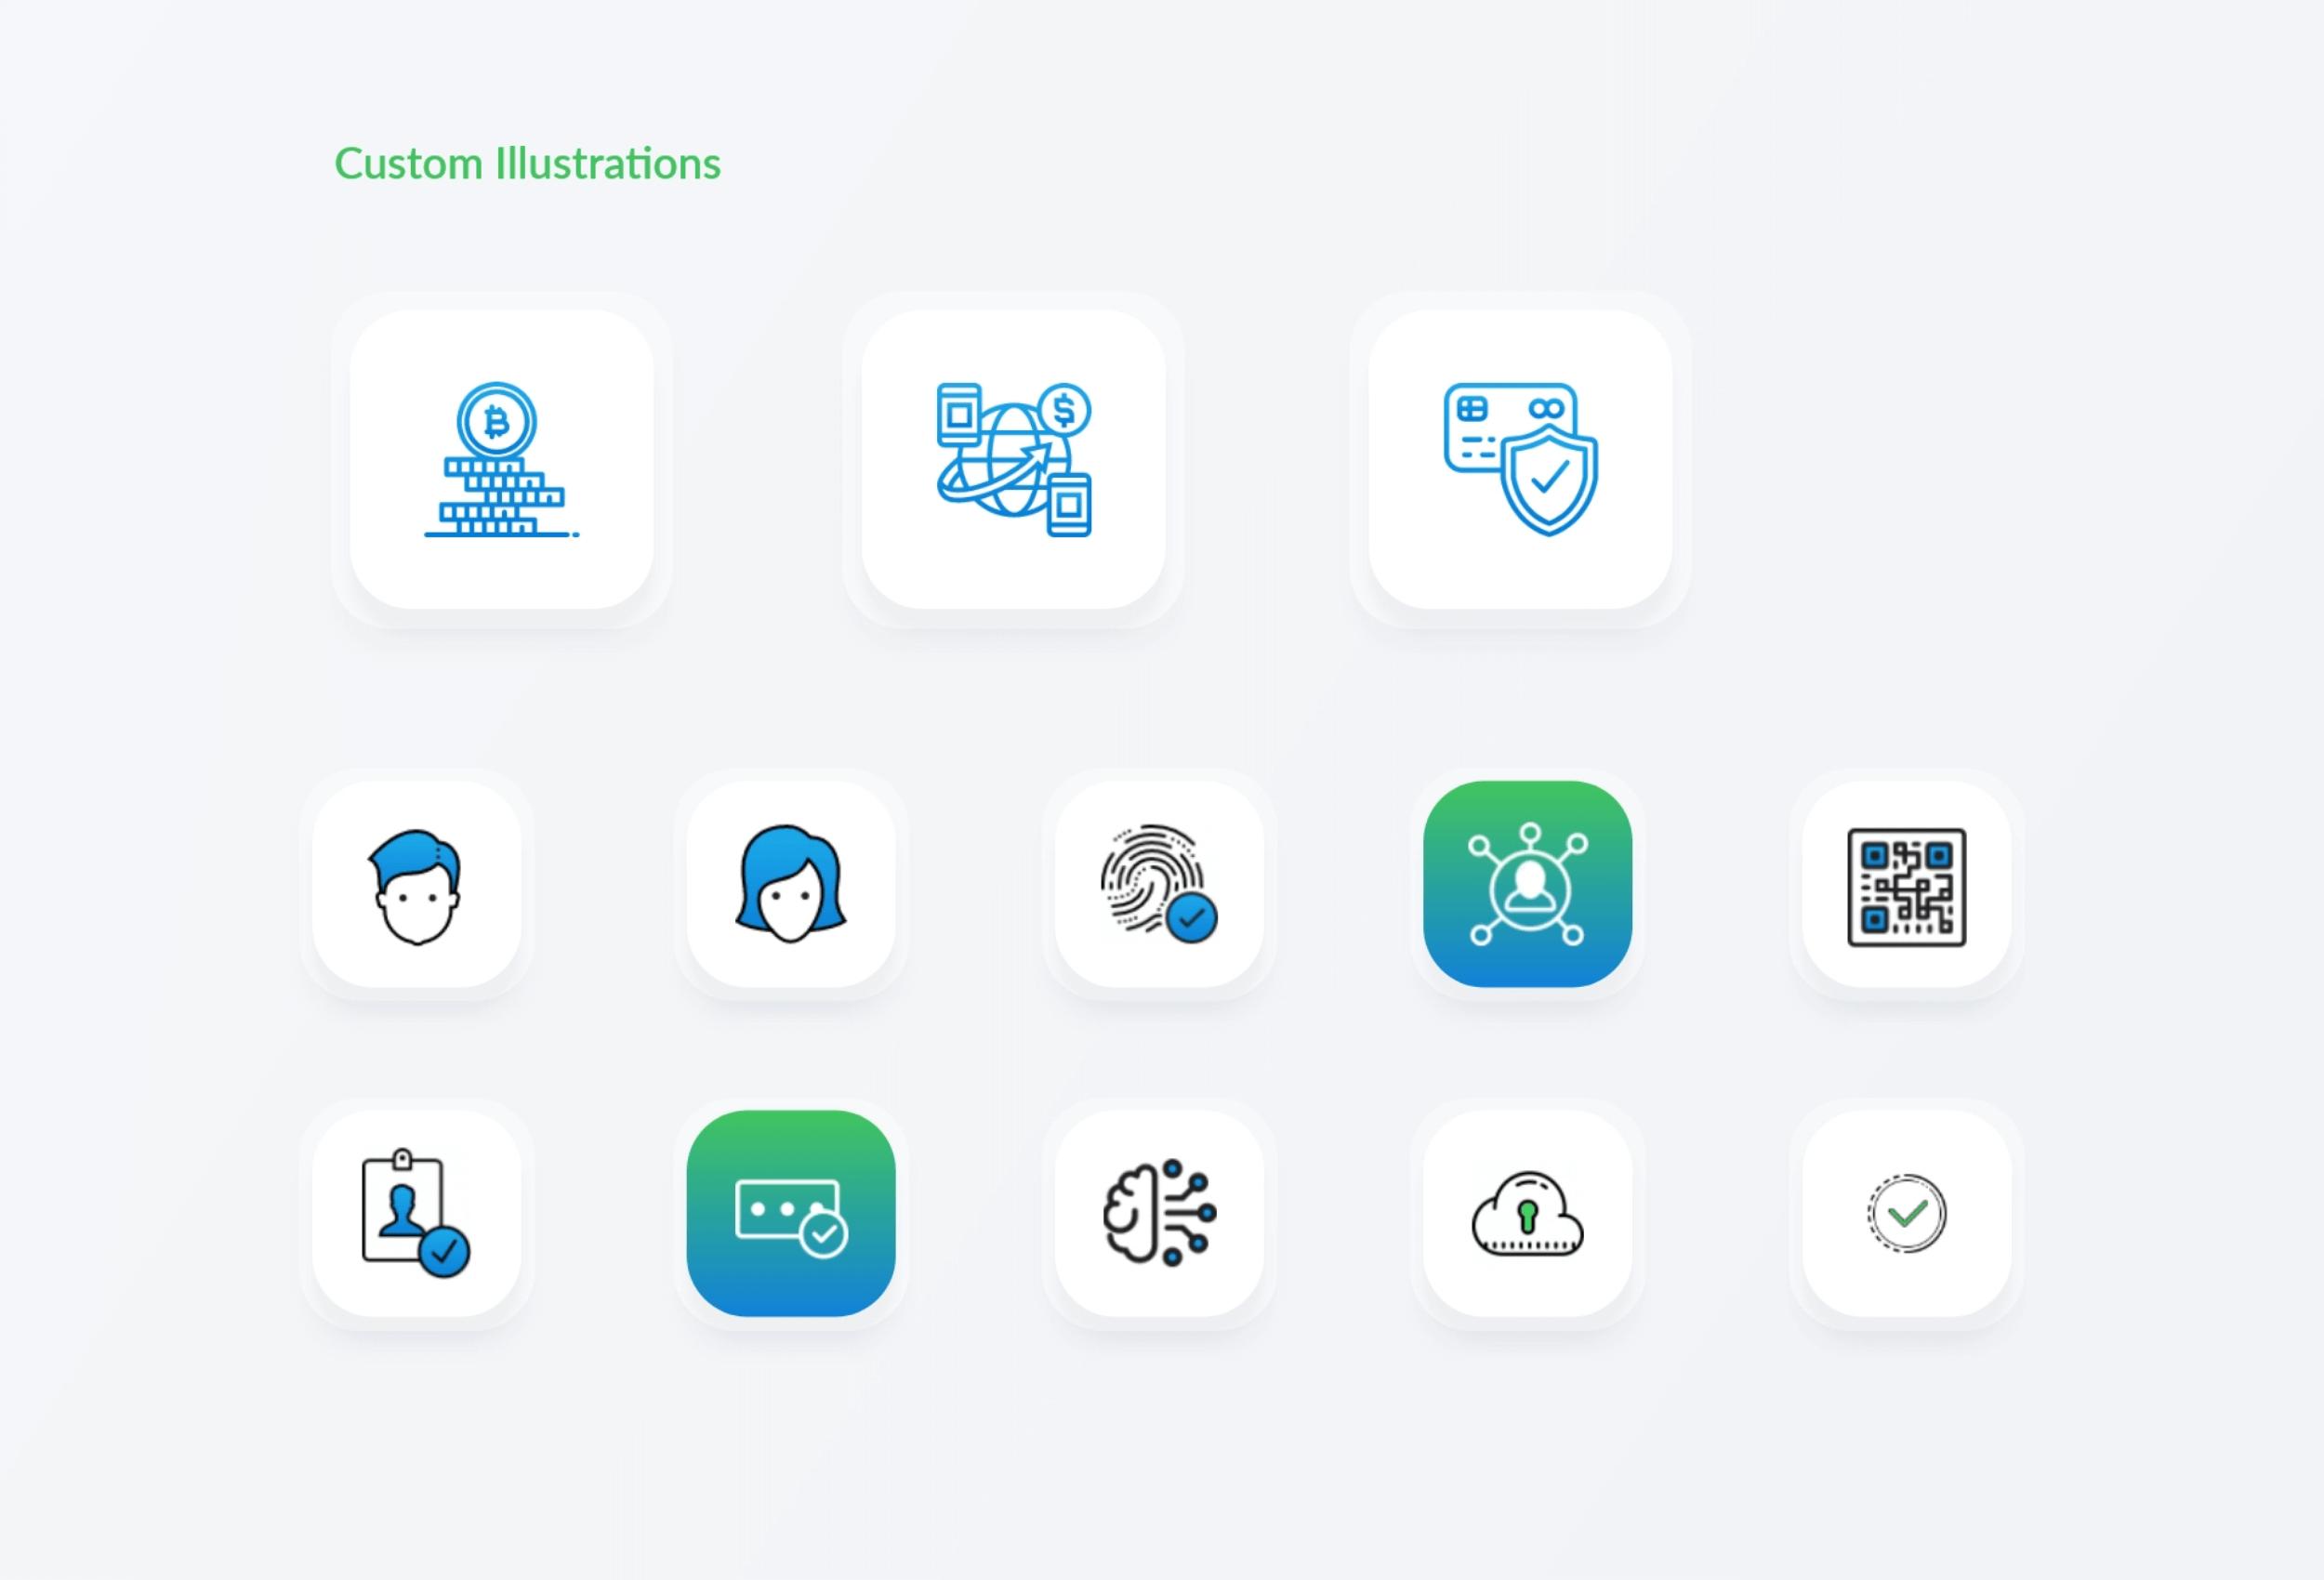 Custom icons used